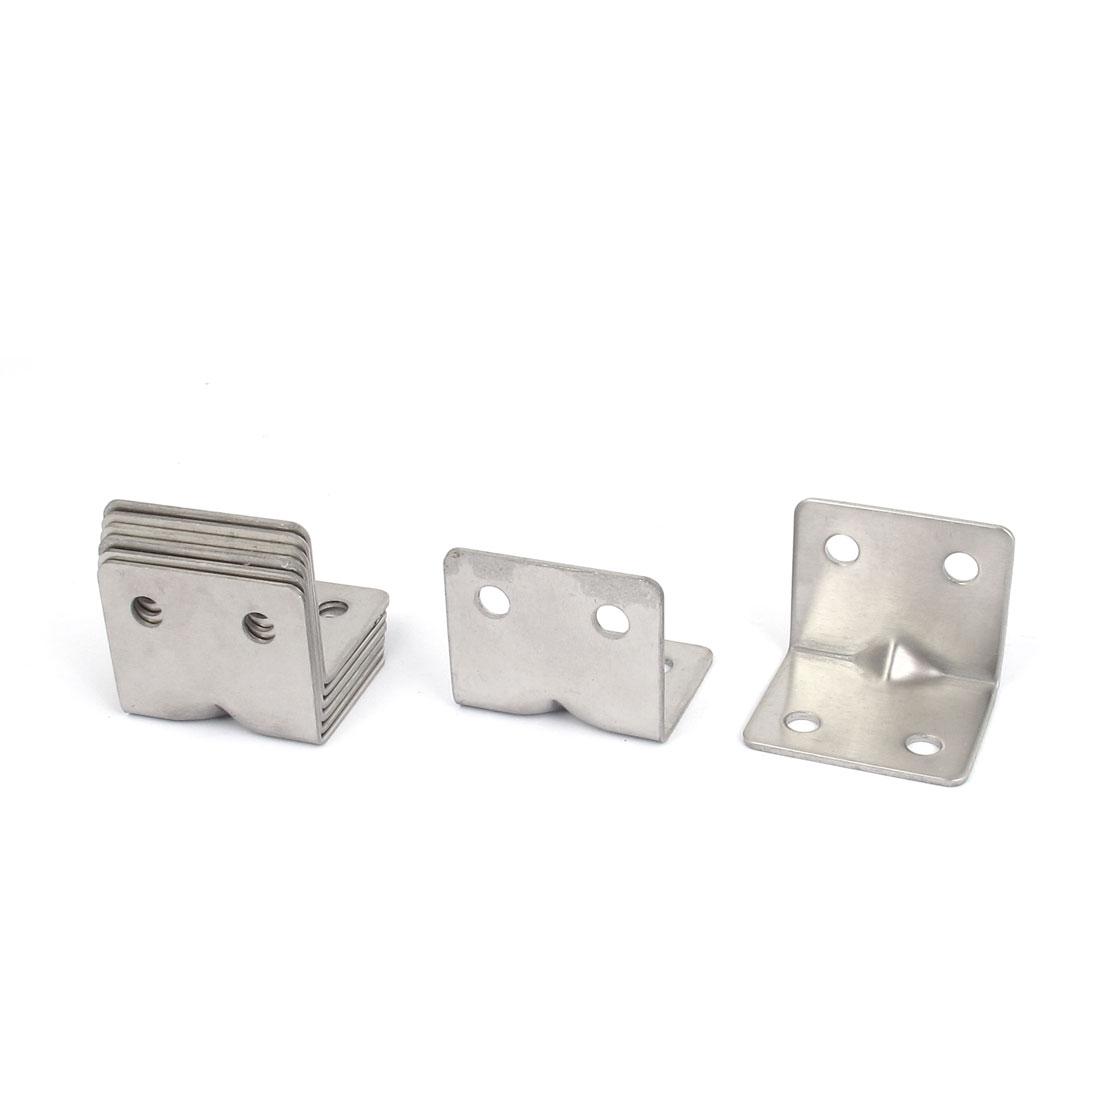 30mmx30mmx37mm L Shape Shelf Corner Brace Plate Right Angle Bracket 8pcs